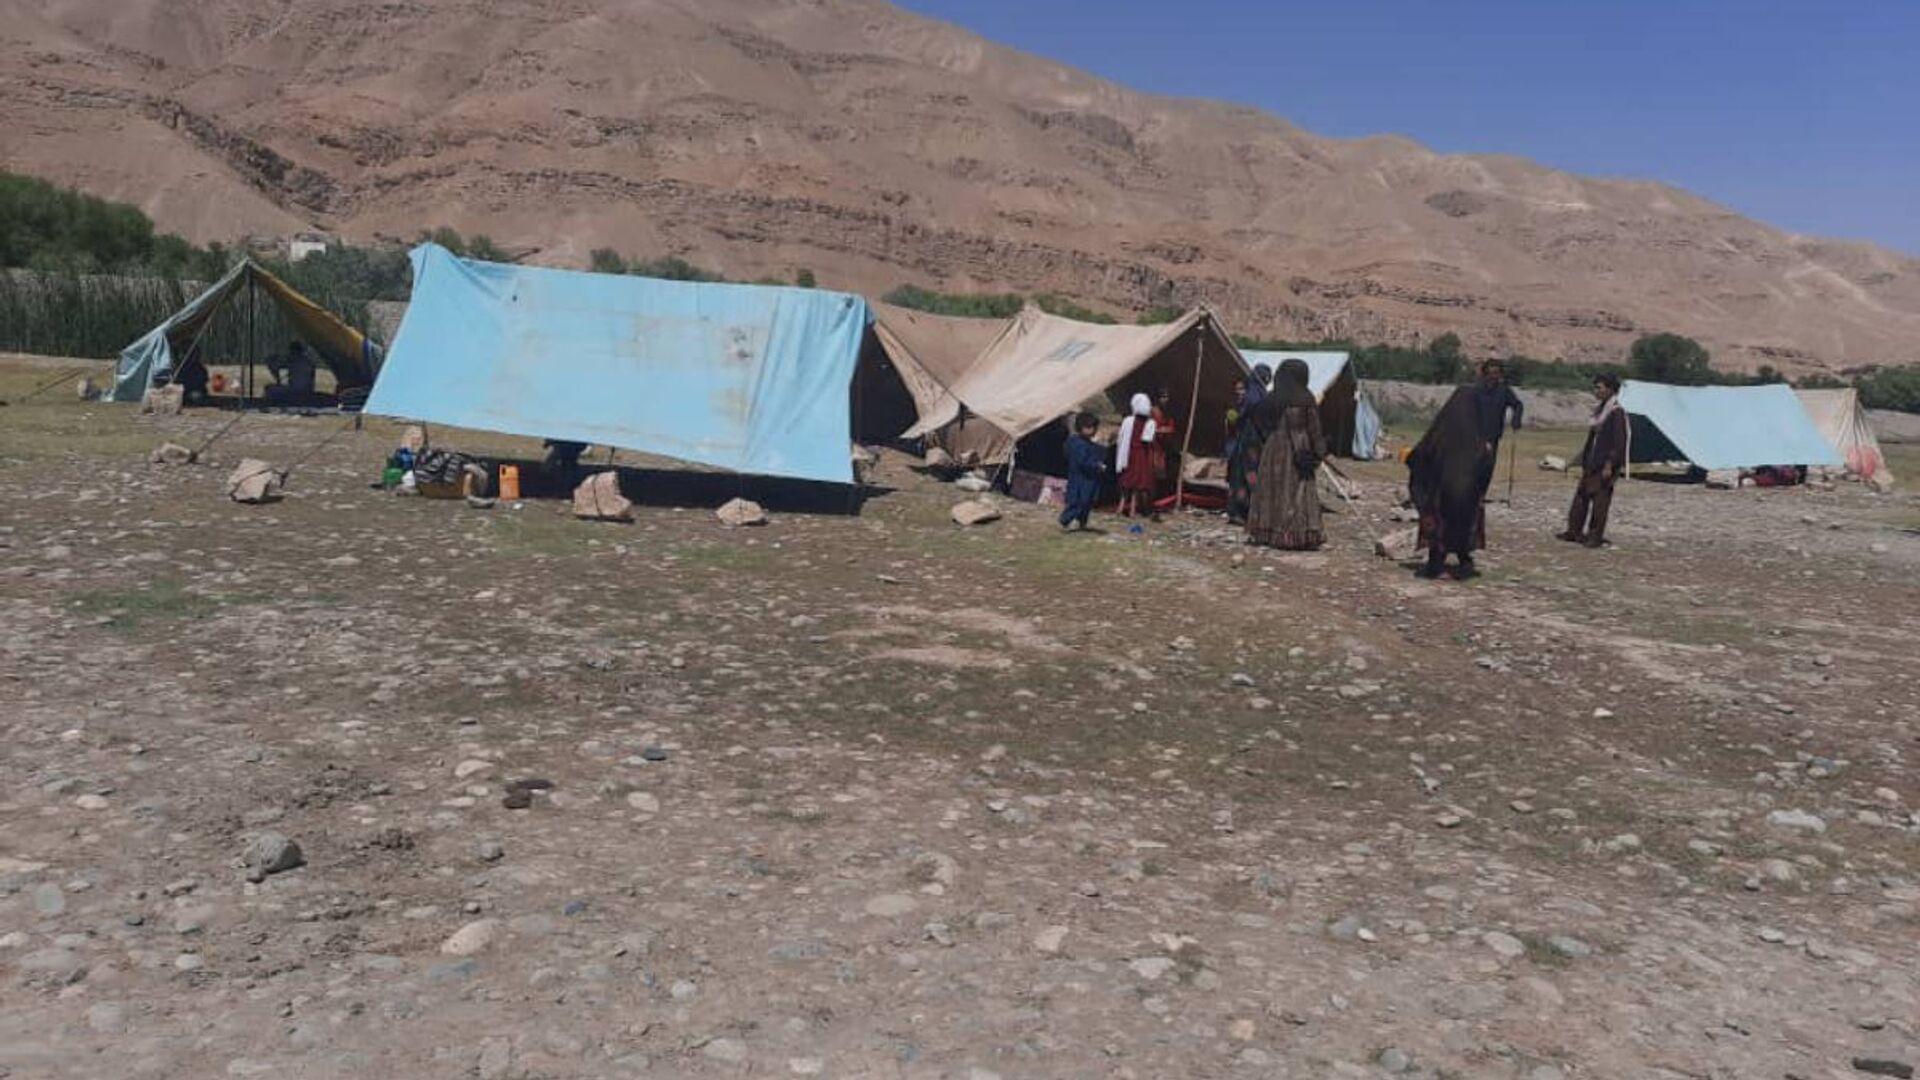 Rifugiati nella provincia afghana di Baghlan - Sputnik Italia, 1920, 14.08.2021